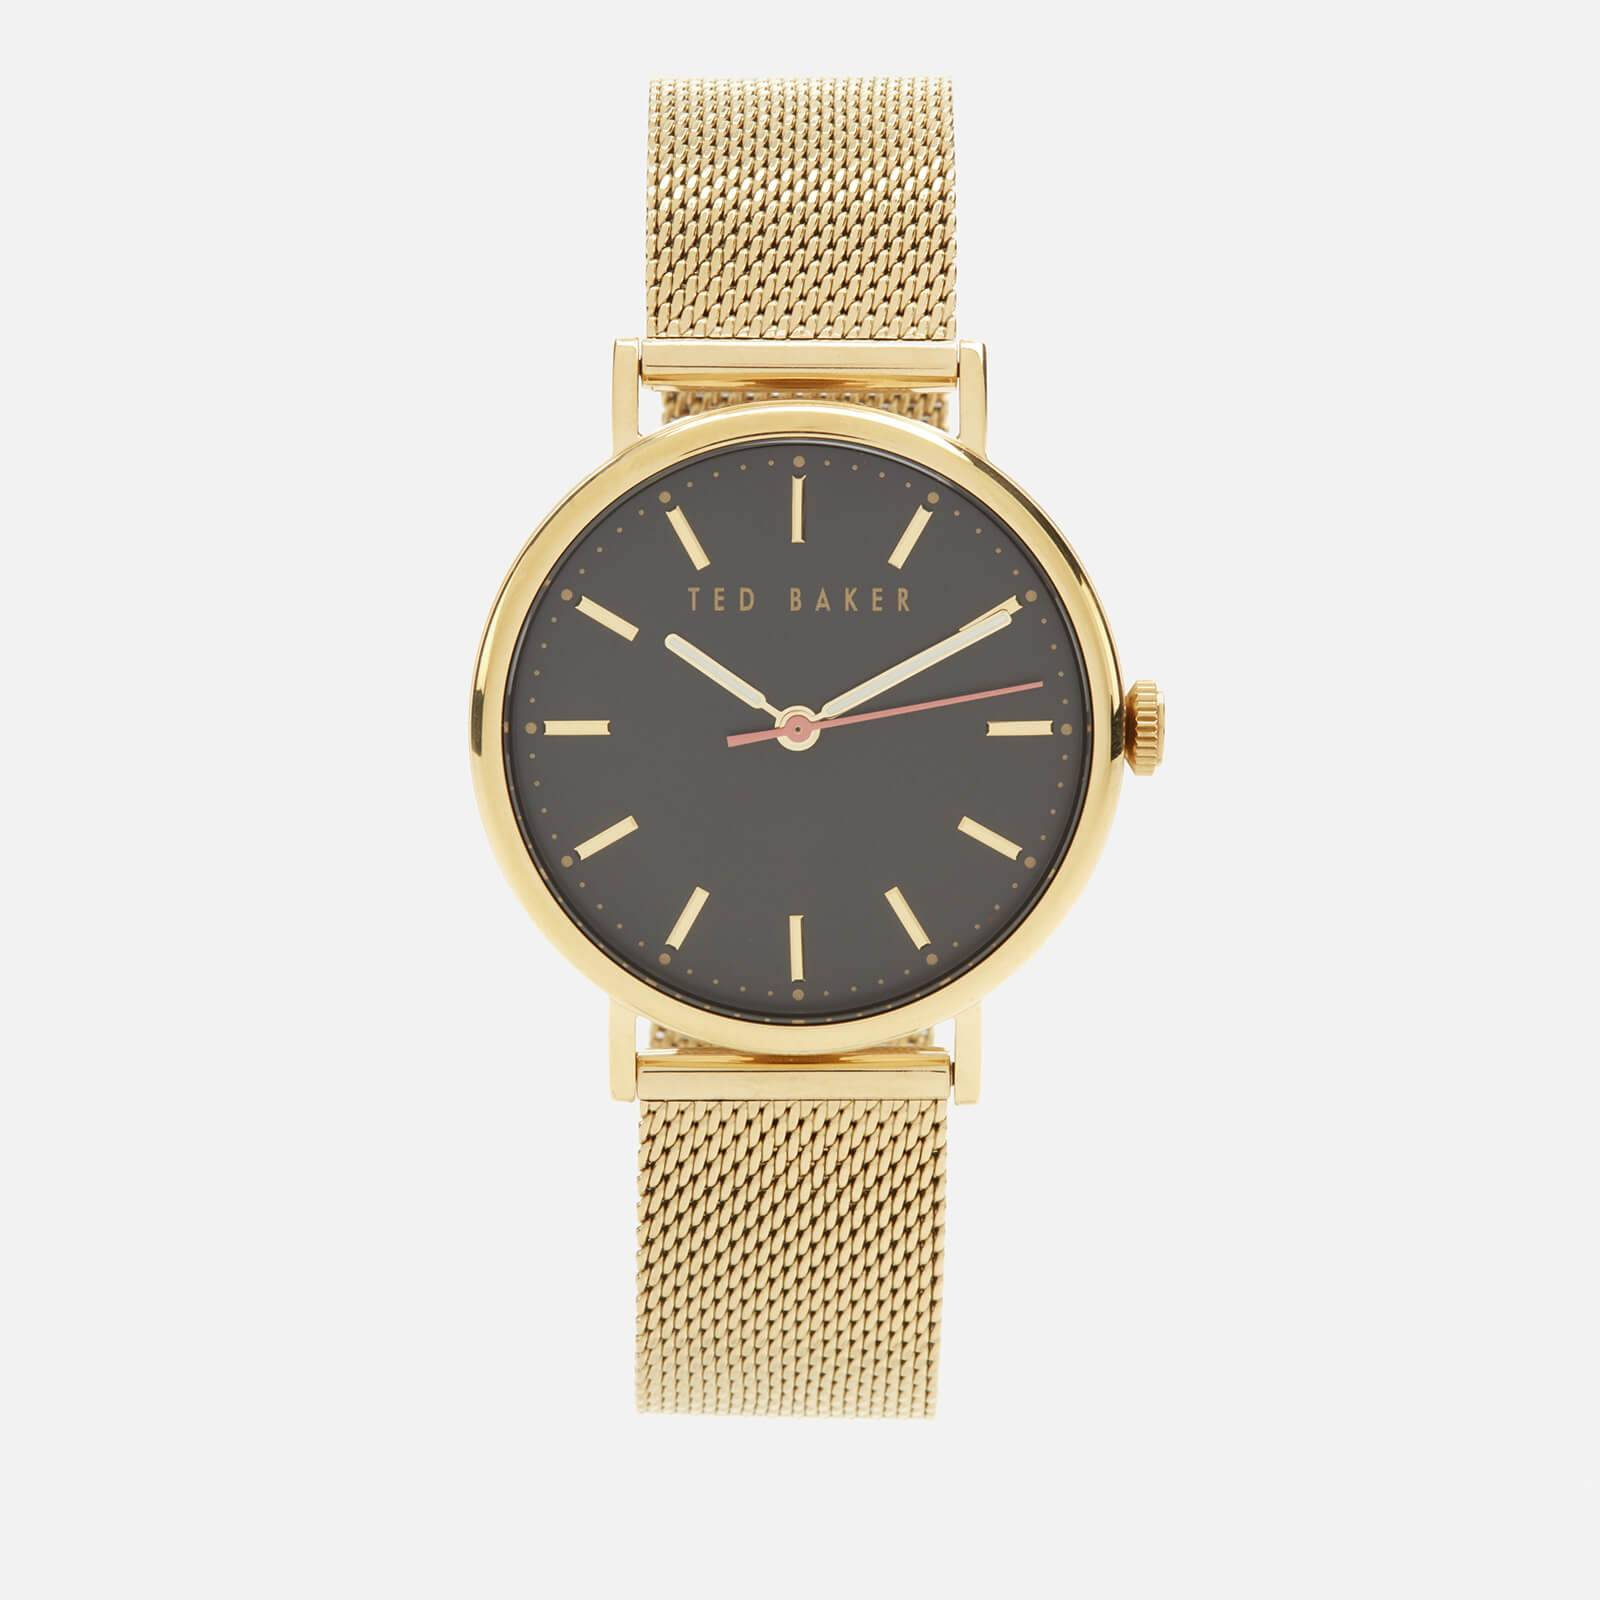 Ted Baker Women's Phylipa Metal Watch - Black/Gold